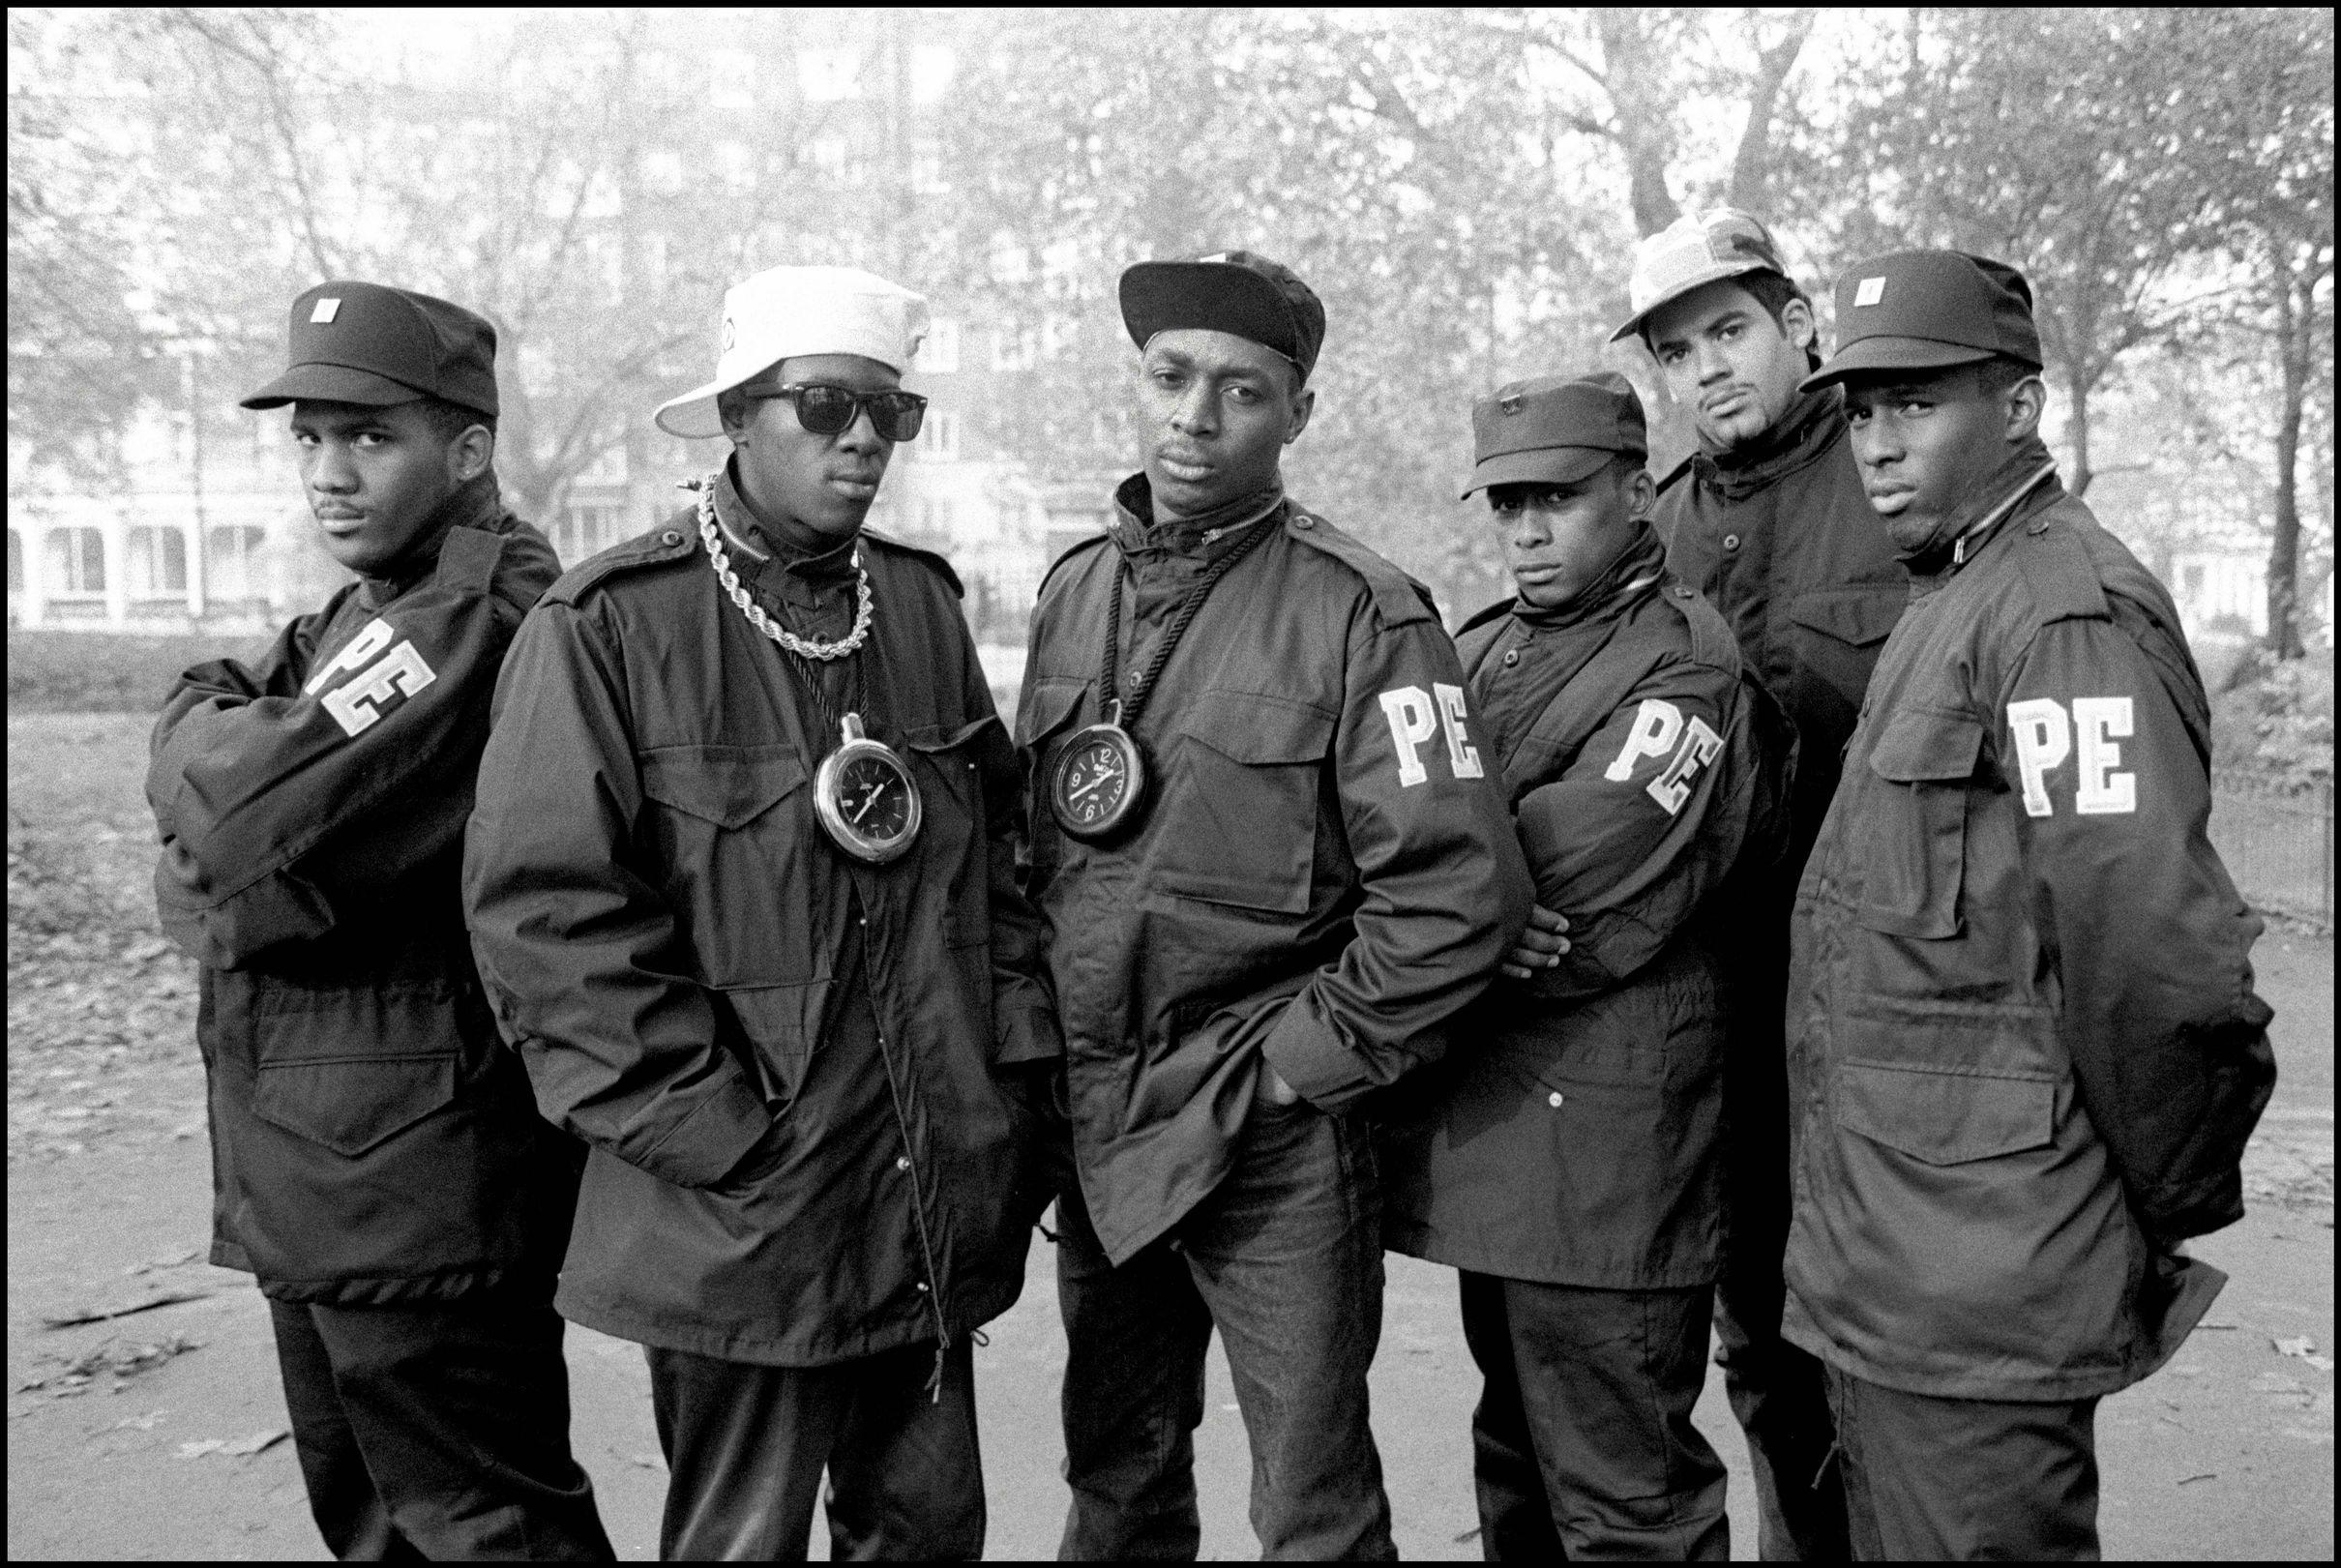 Public Enemy in Hyde Park, London, UK 2 November 1987